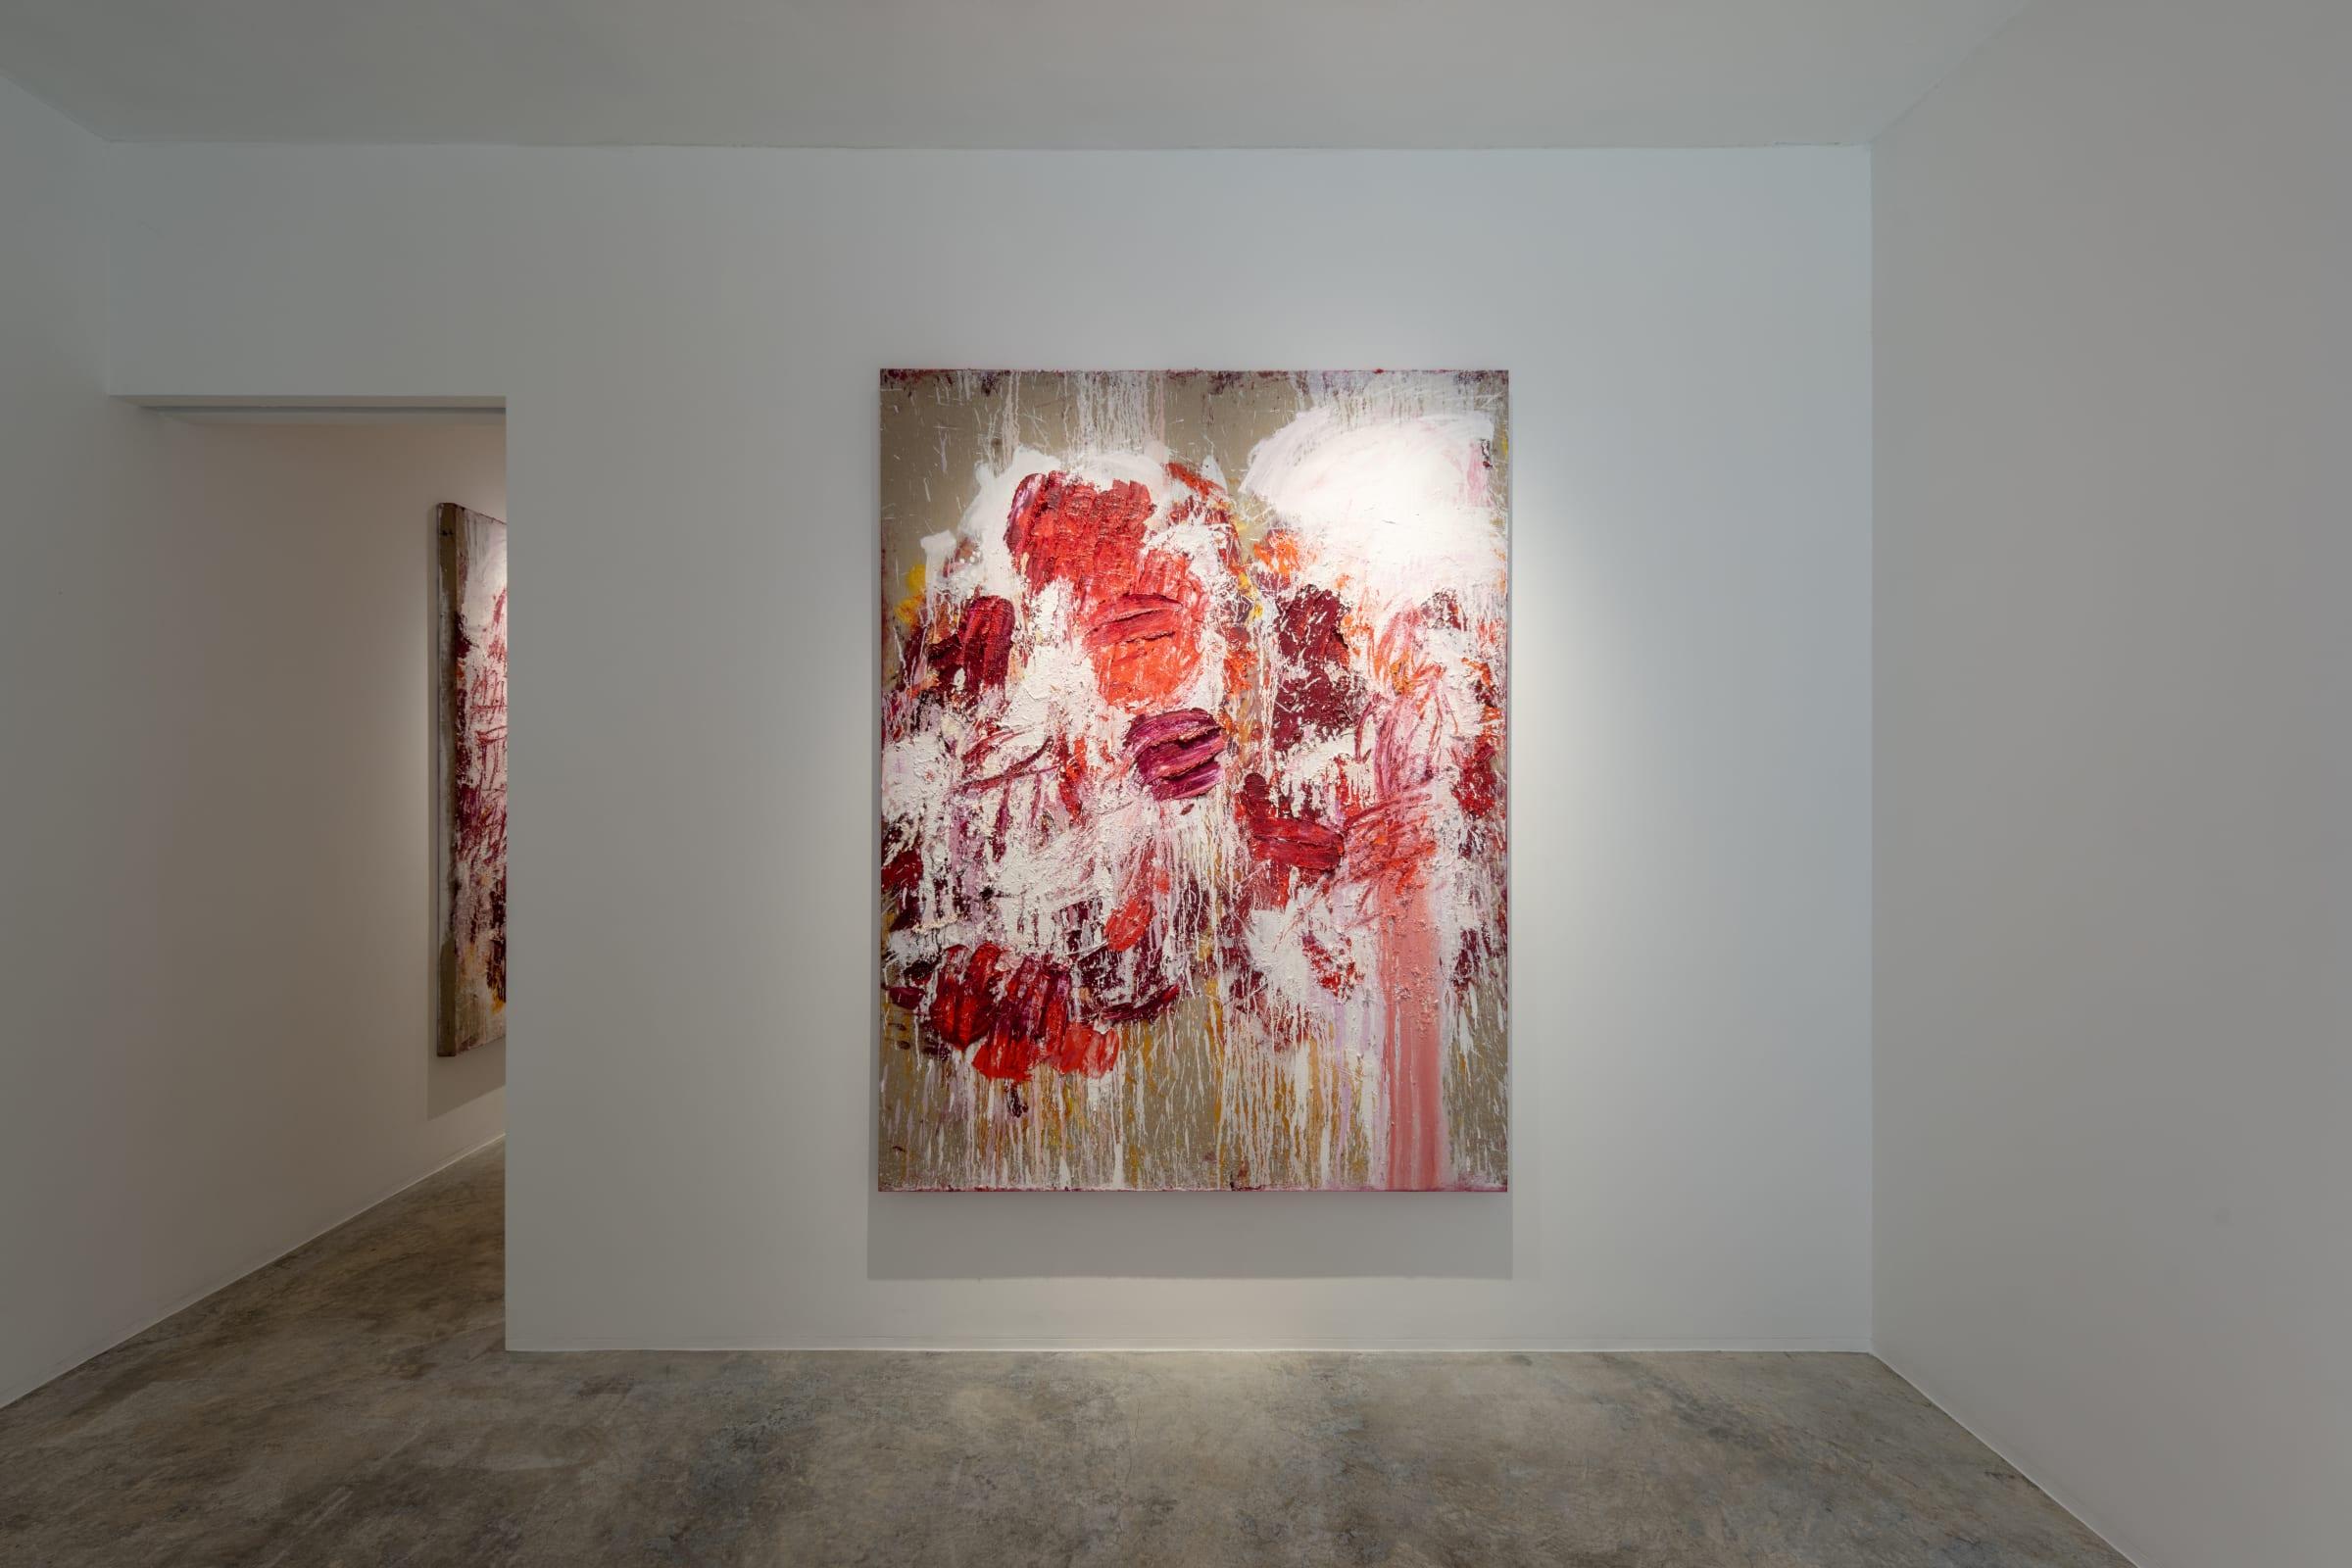 Aida Tomescu Into a carpet made of water